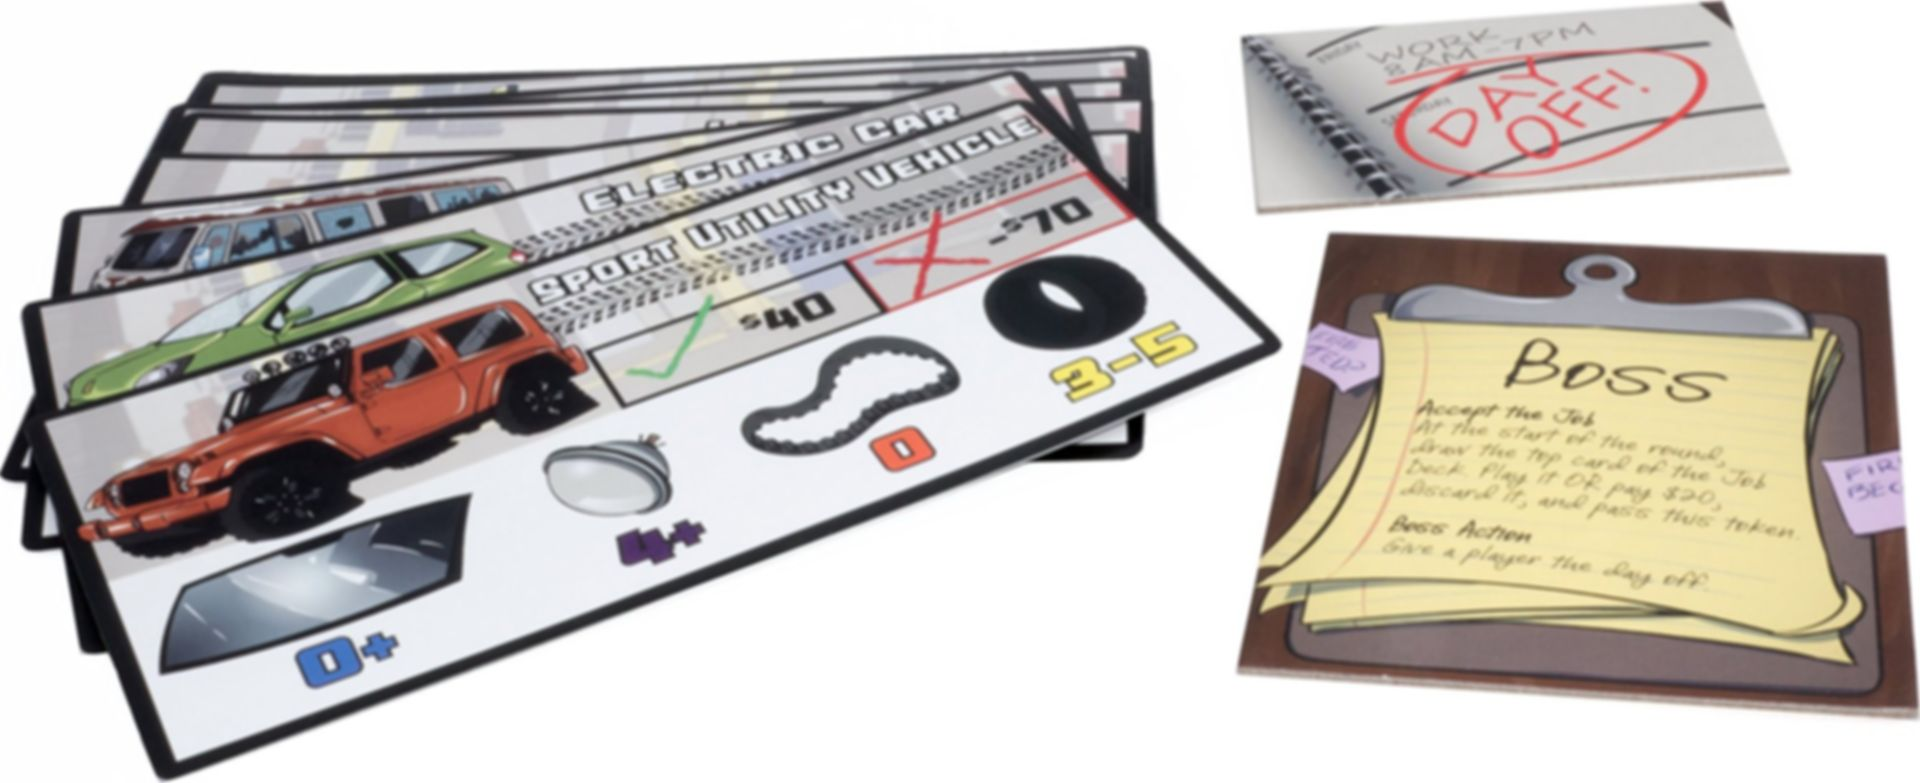 Traitor Mechanic: The Traitor Mechanic Game components